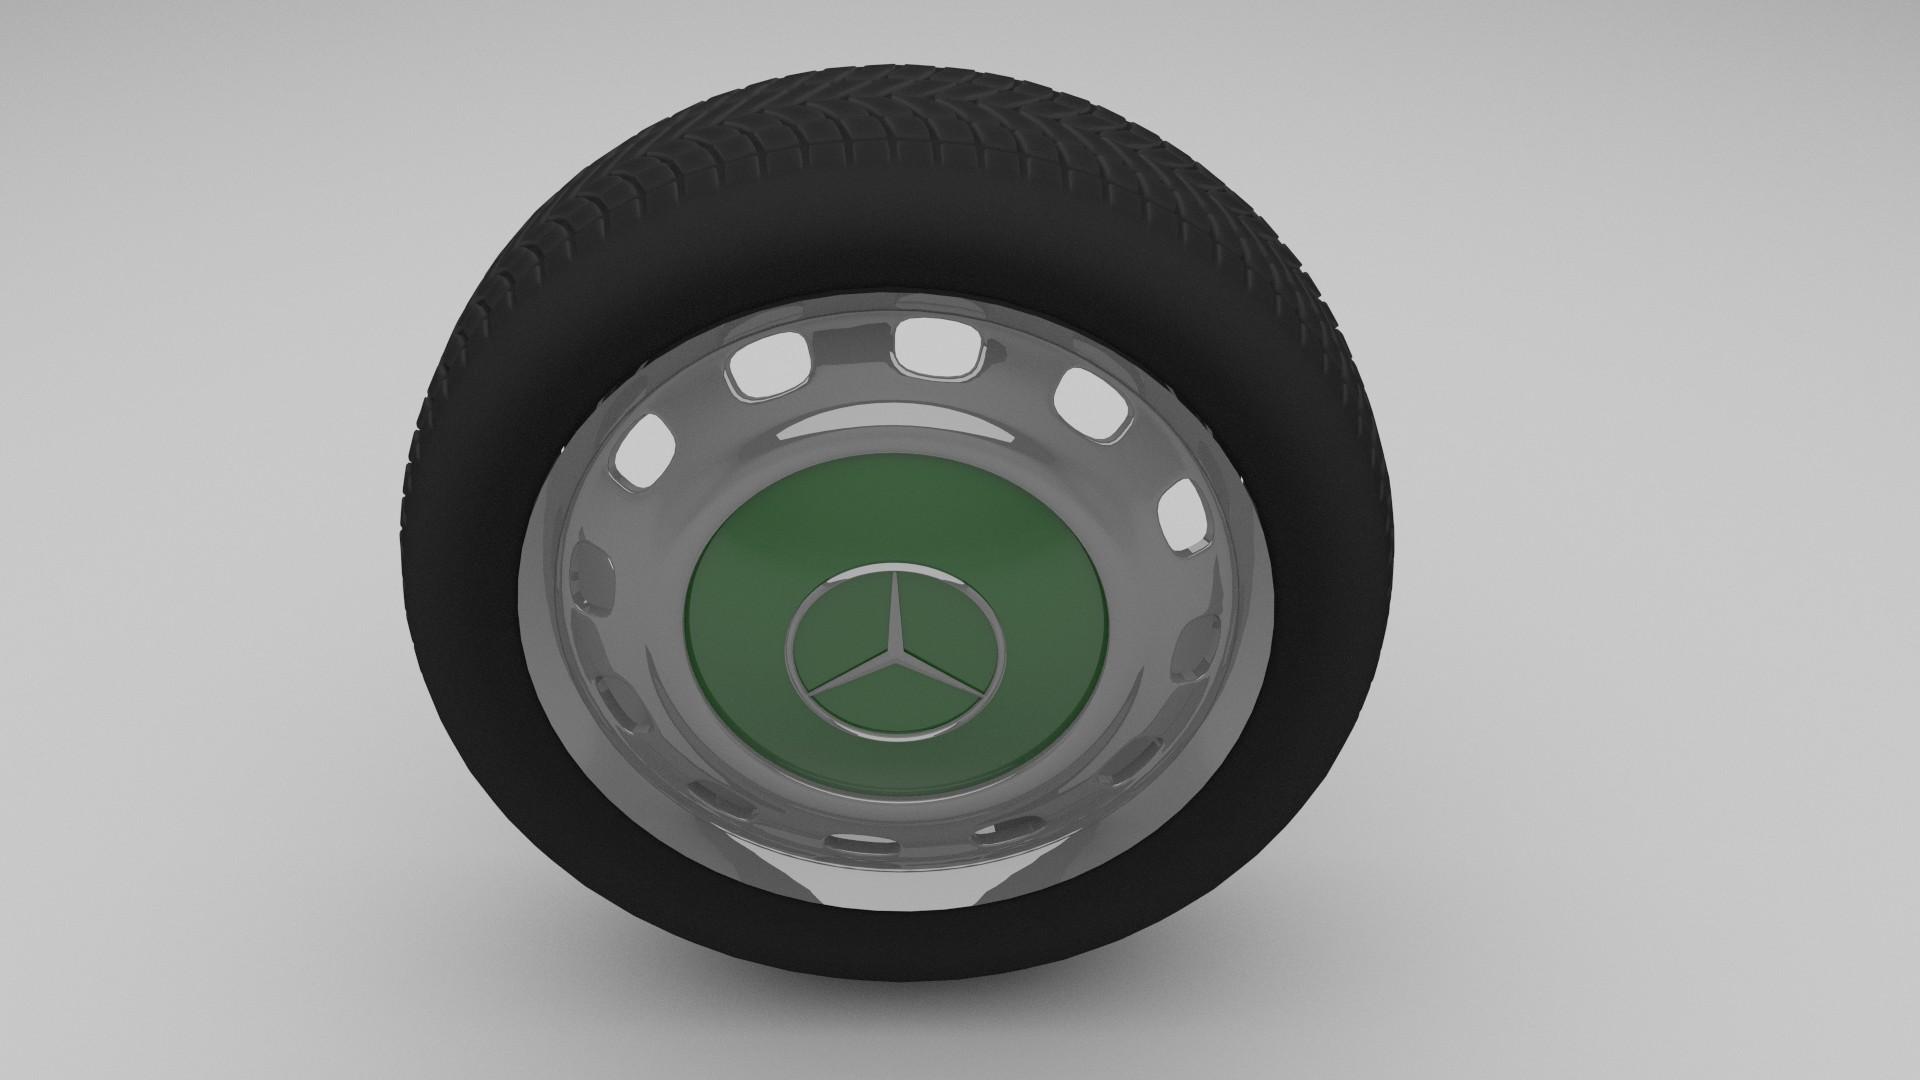 Mercedes W 123 Wheel